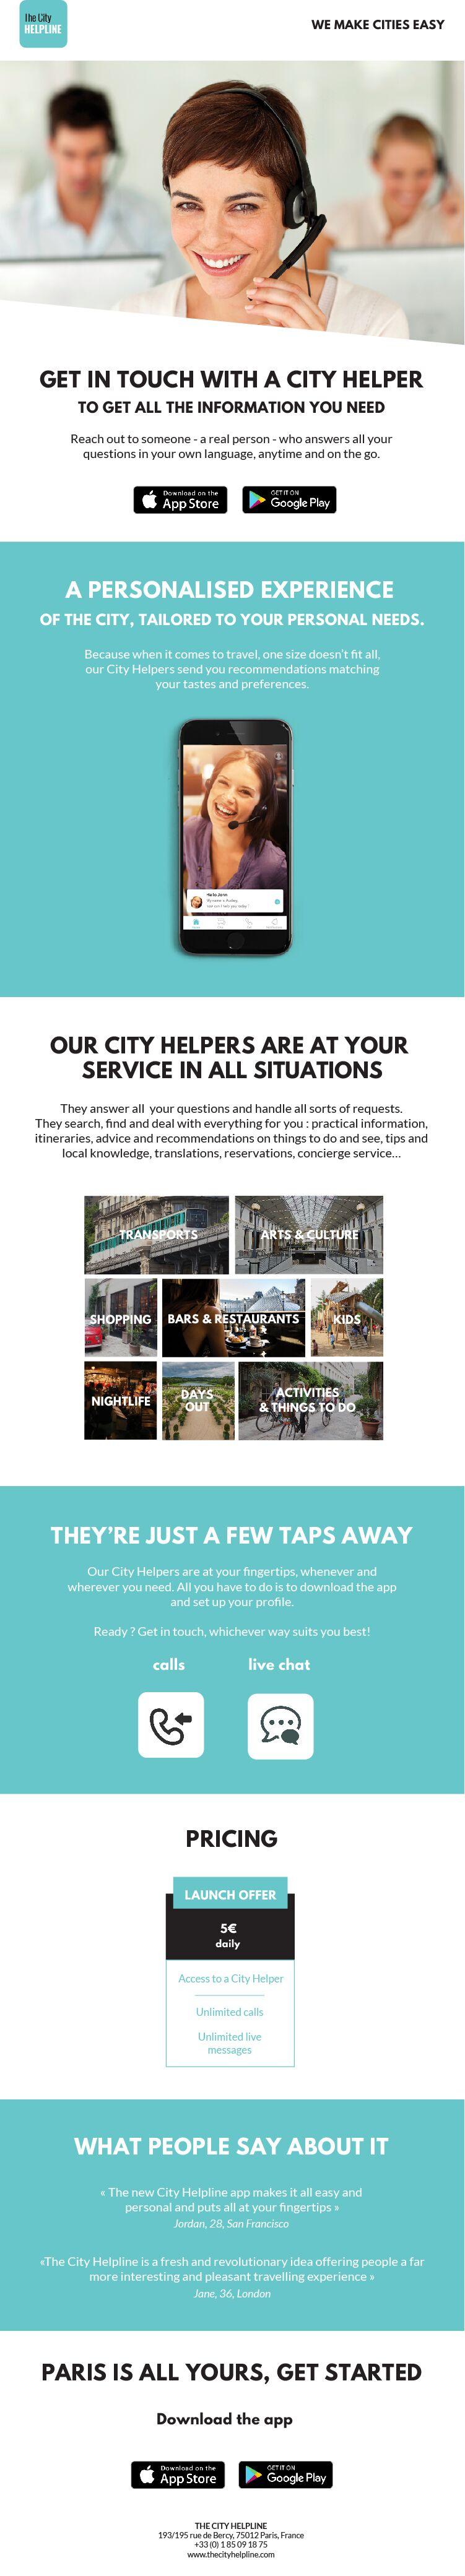 The City Helpline: a new virtual concierge